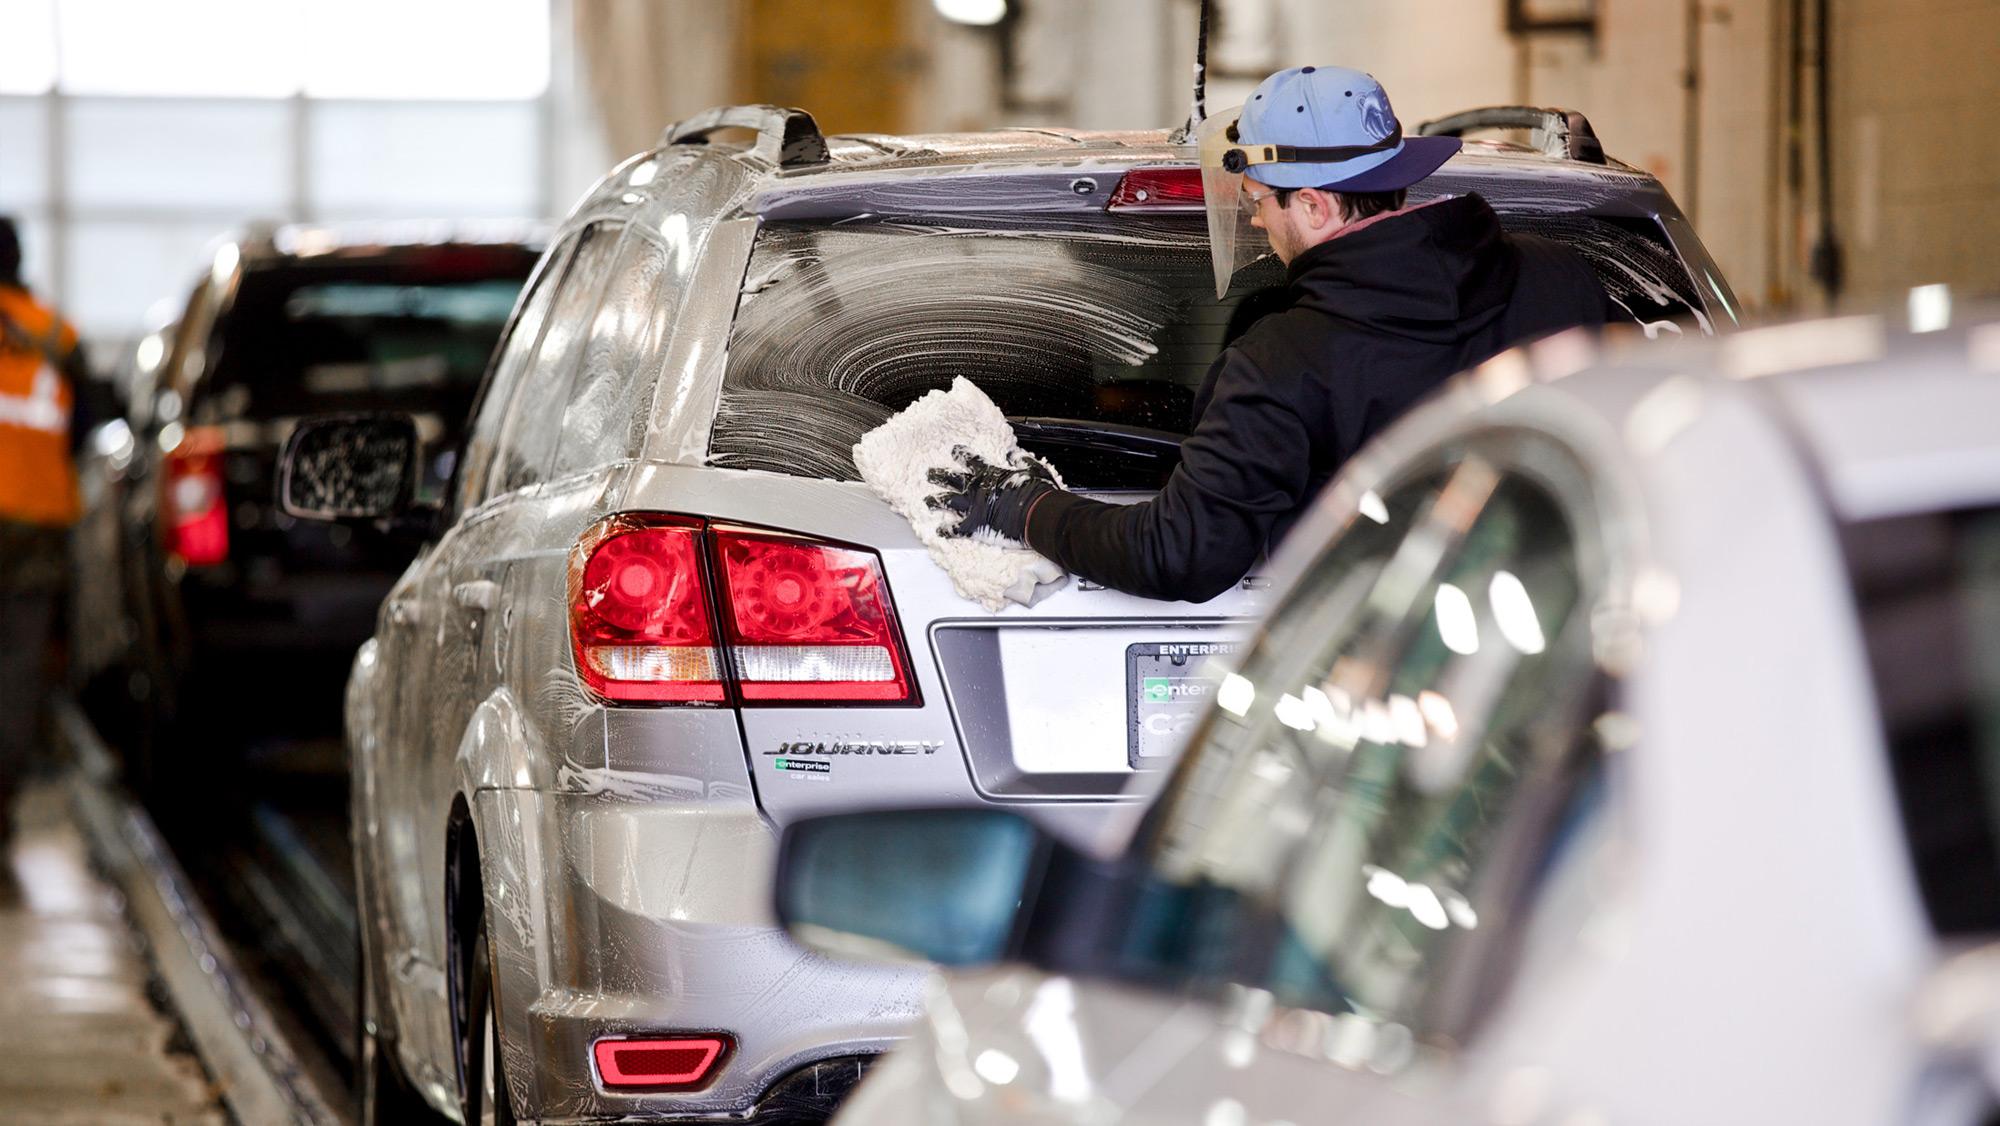 Worker washing car